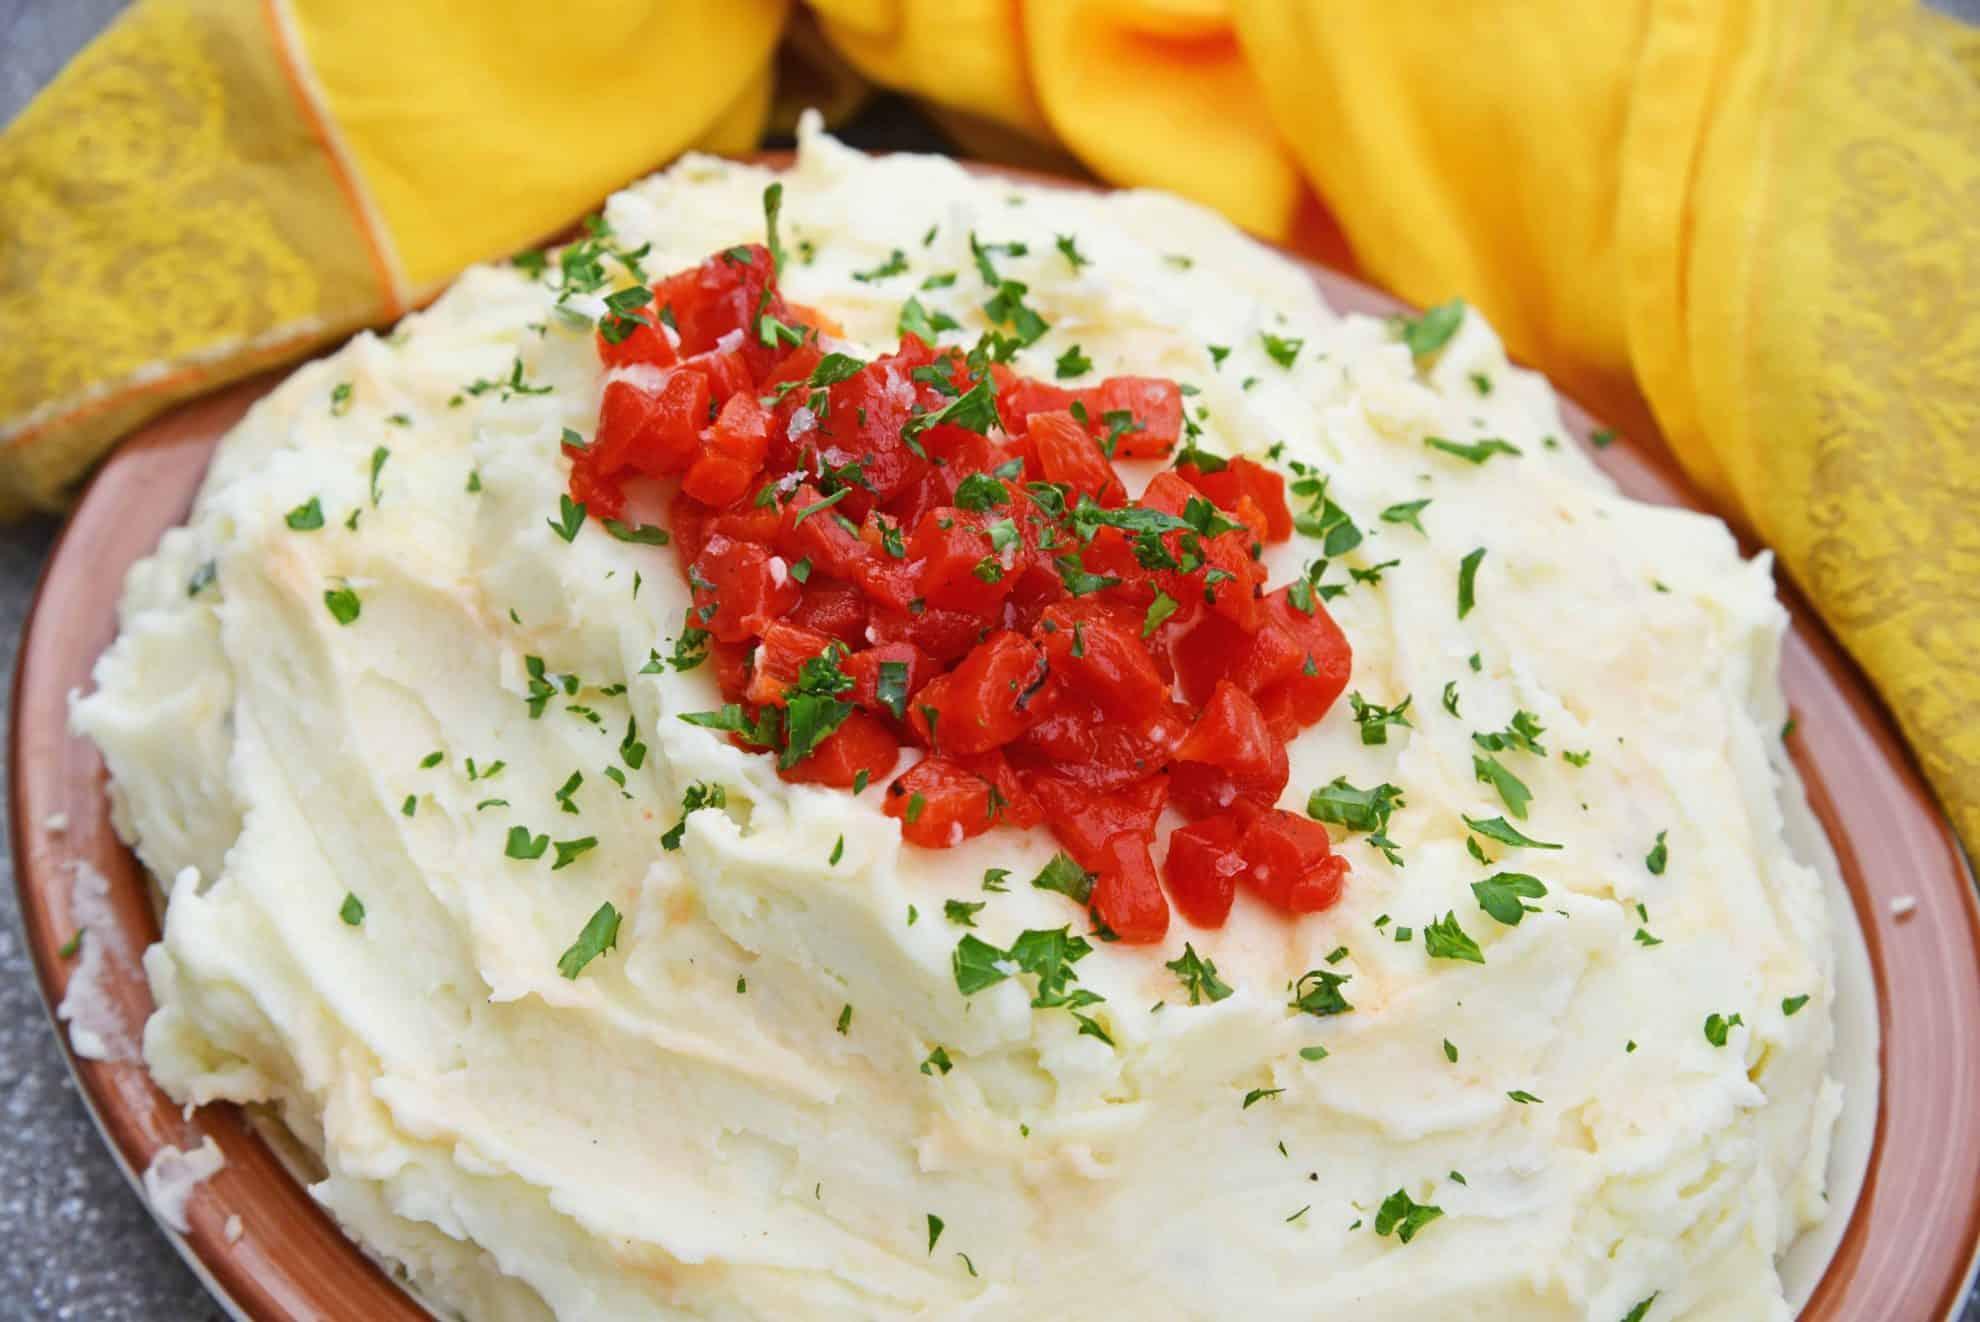 Mascarpone Mashed Potatoes take traditional mashed potatoes up a notch by adding creamy mascarpone and roasted red peppers!#howtomakemashedpotatoes #bestmashedpotatoes www.savoryexperiments.com